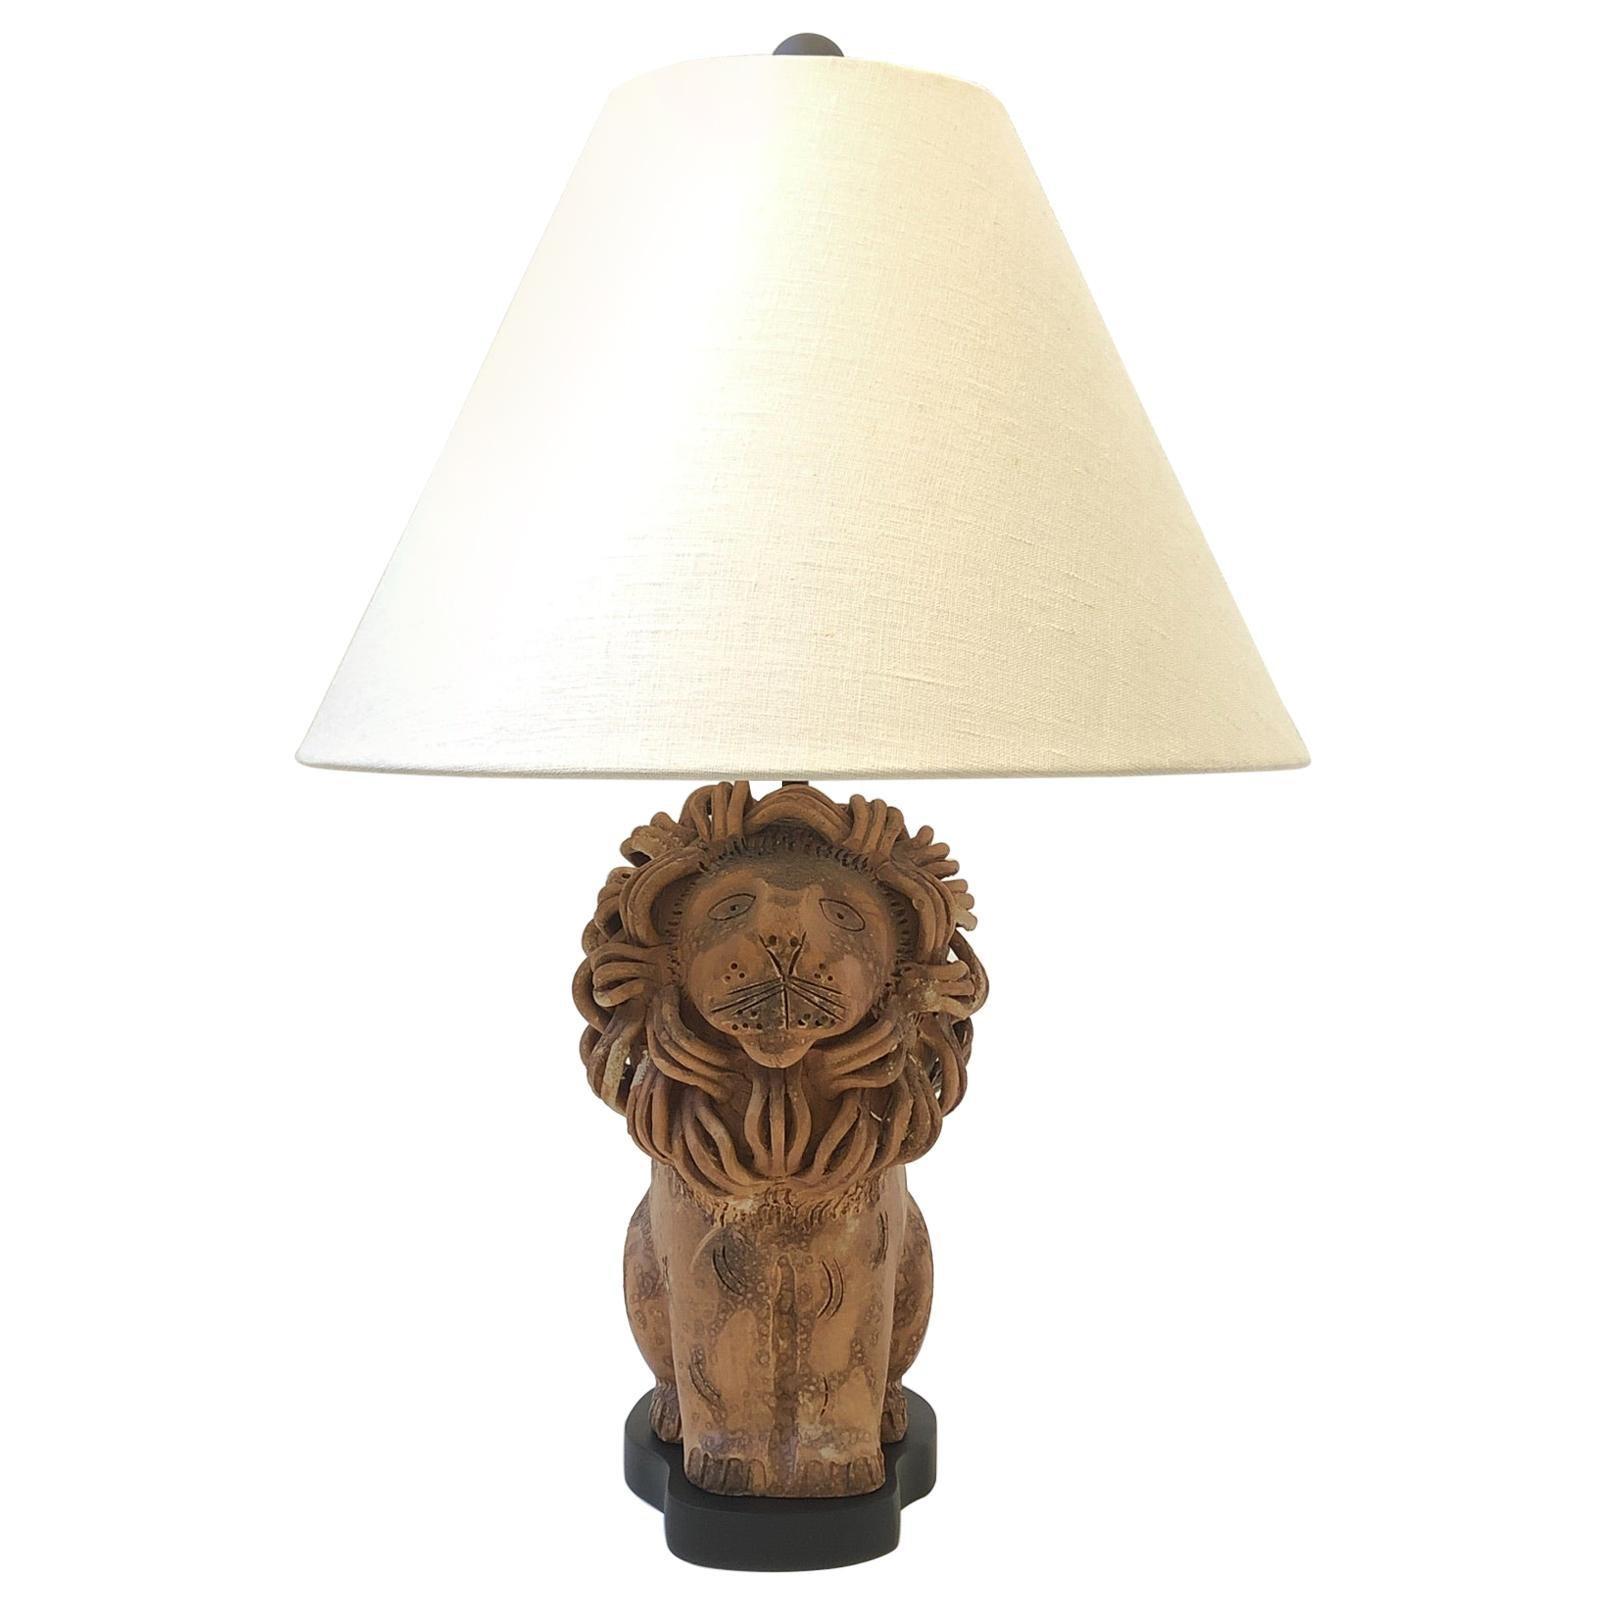 Rare Italian Ceramic Lion Table Lamp by Aldo Londi for Bitossi